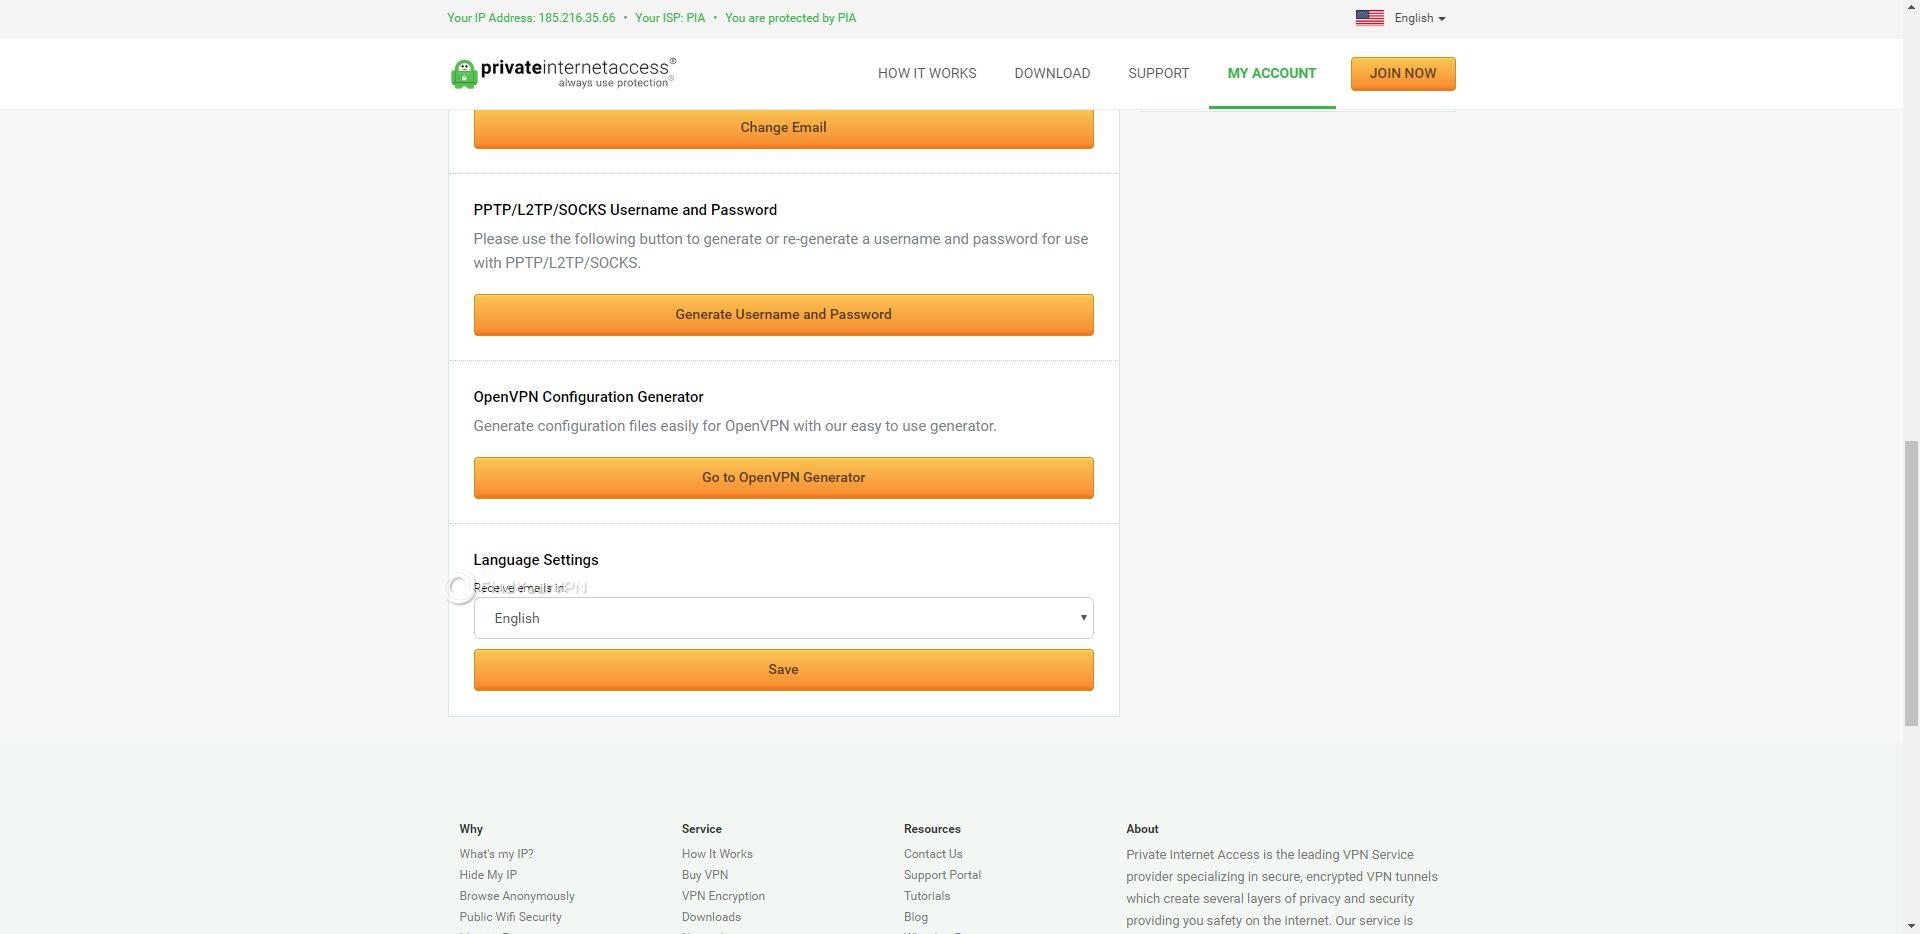 PIA Dashboard Username Generator